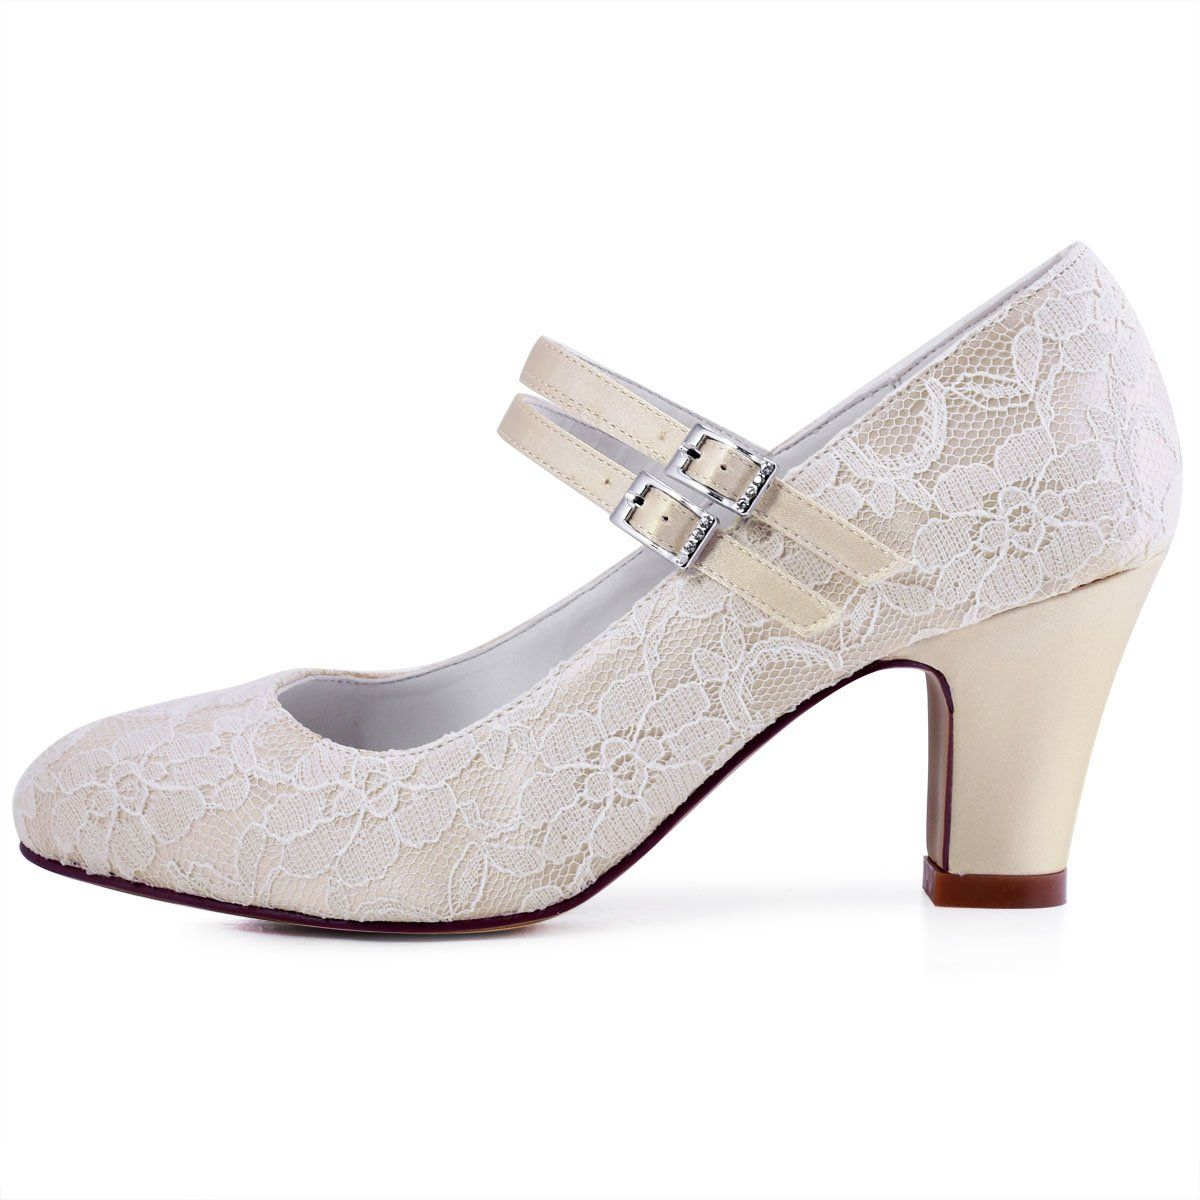 f4eace00021f ElegantPark HC1701 Women Pumps Chunky Heel Mary Jane Closed Toe Lace Bridal  Wedding Shoes Champagne US